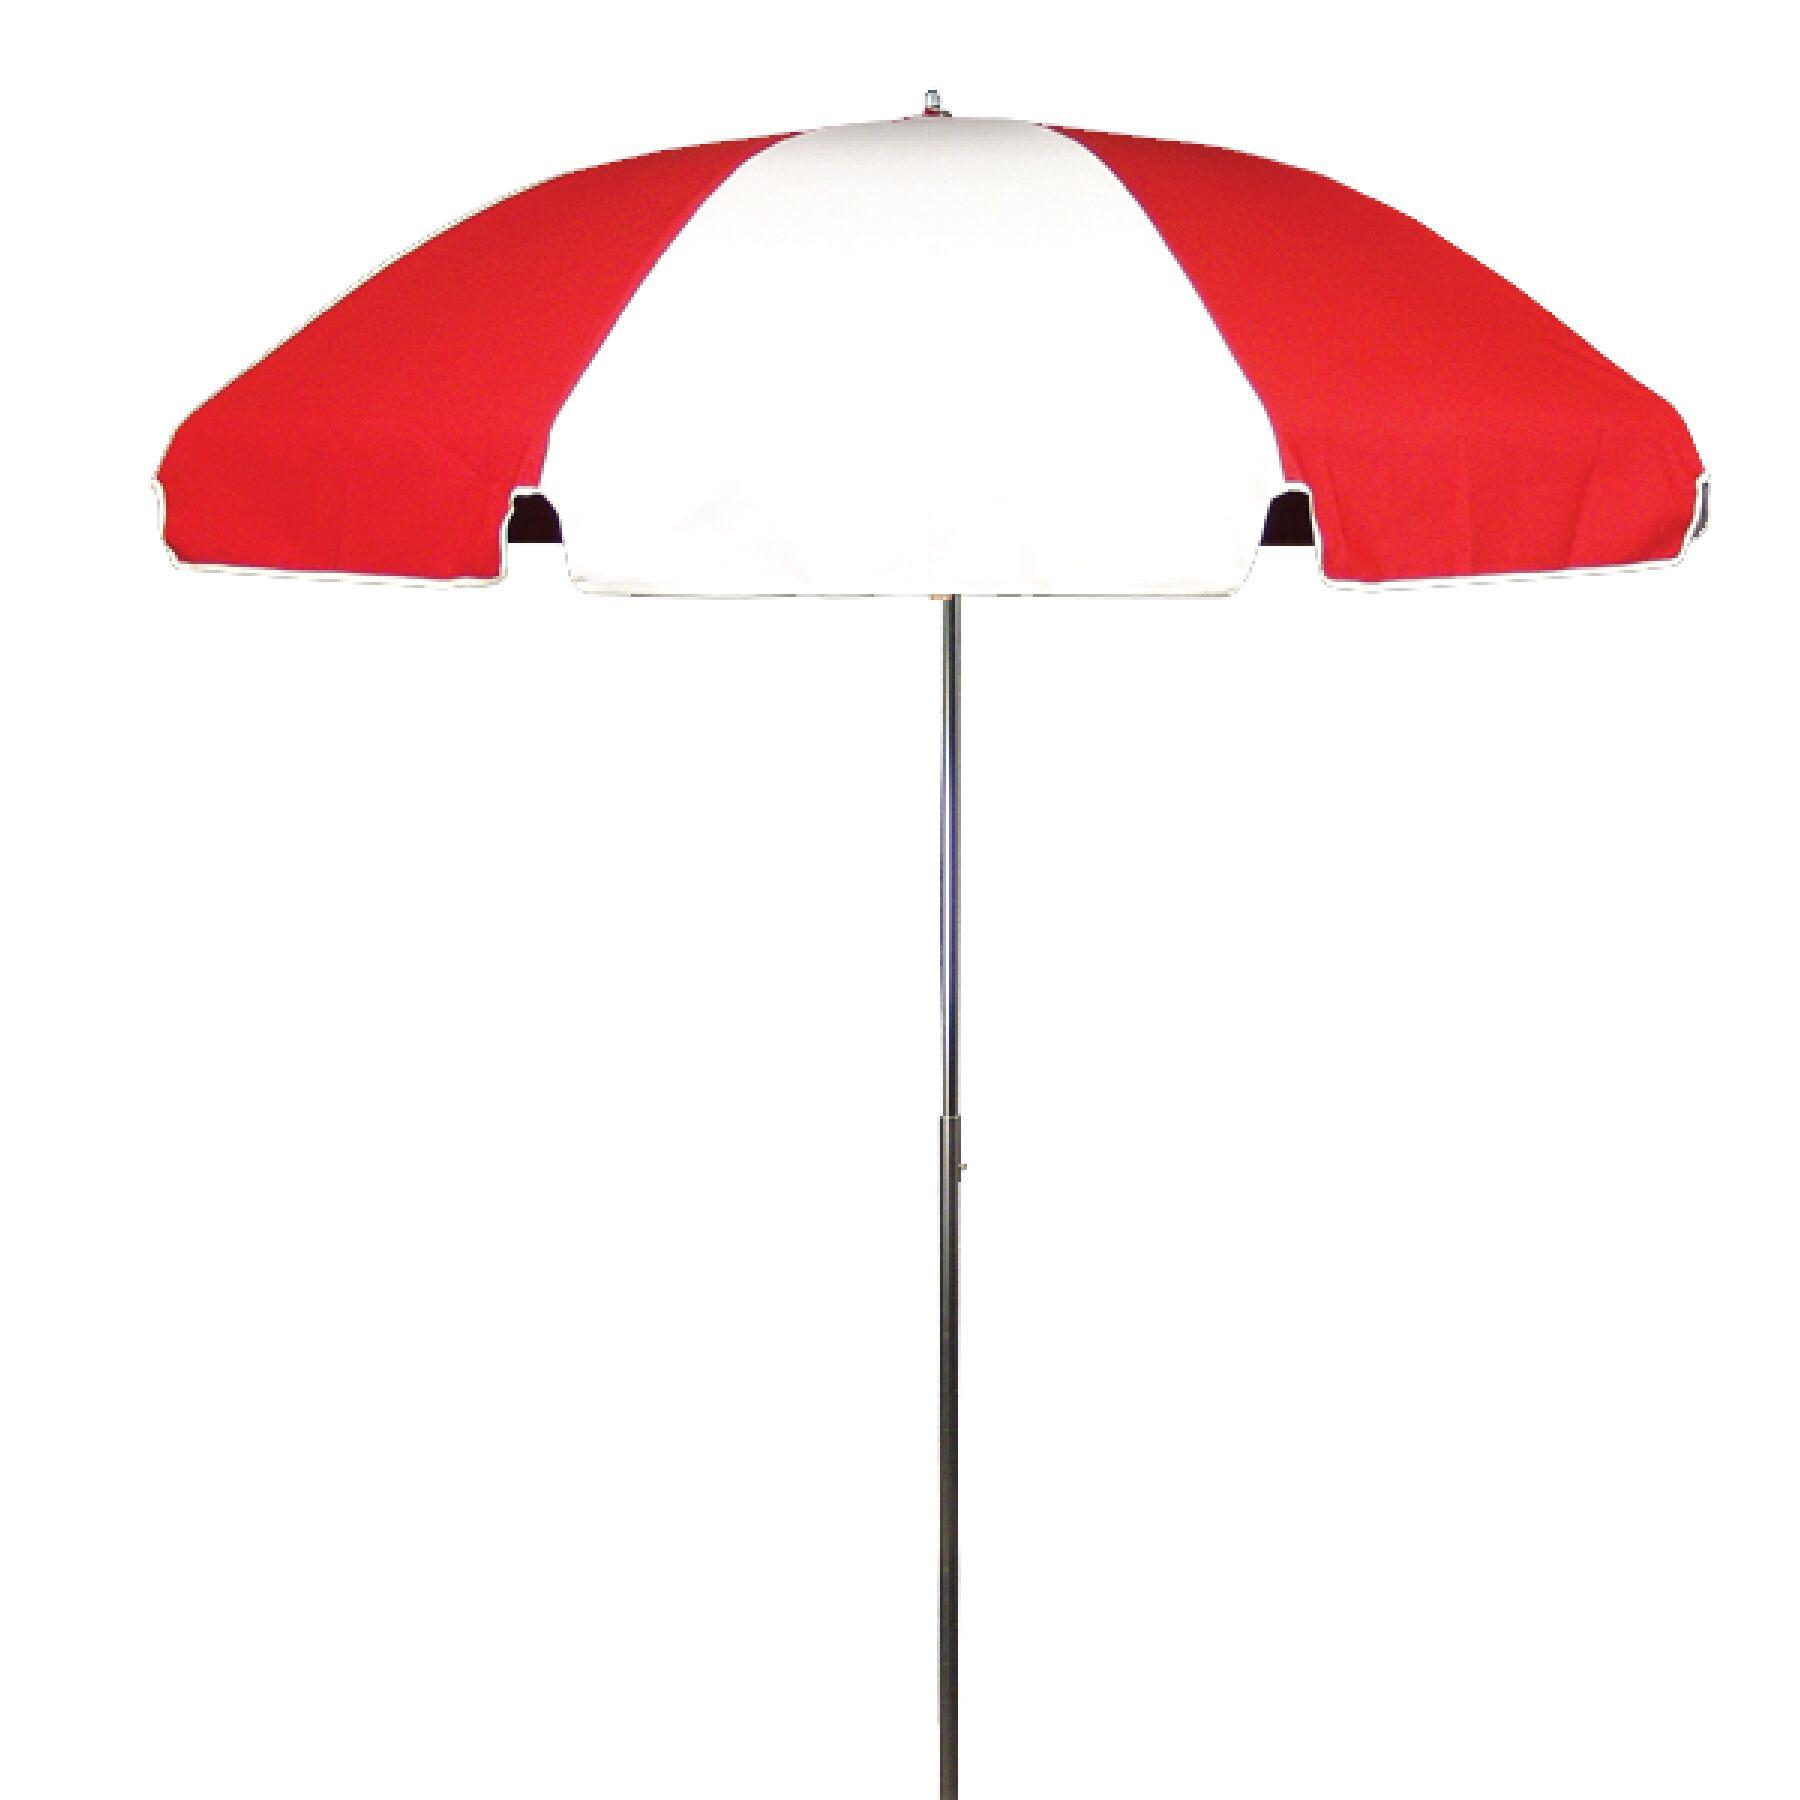 7.5' Drape Umbrella Fabric: Logo Red and White